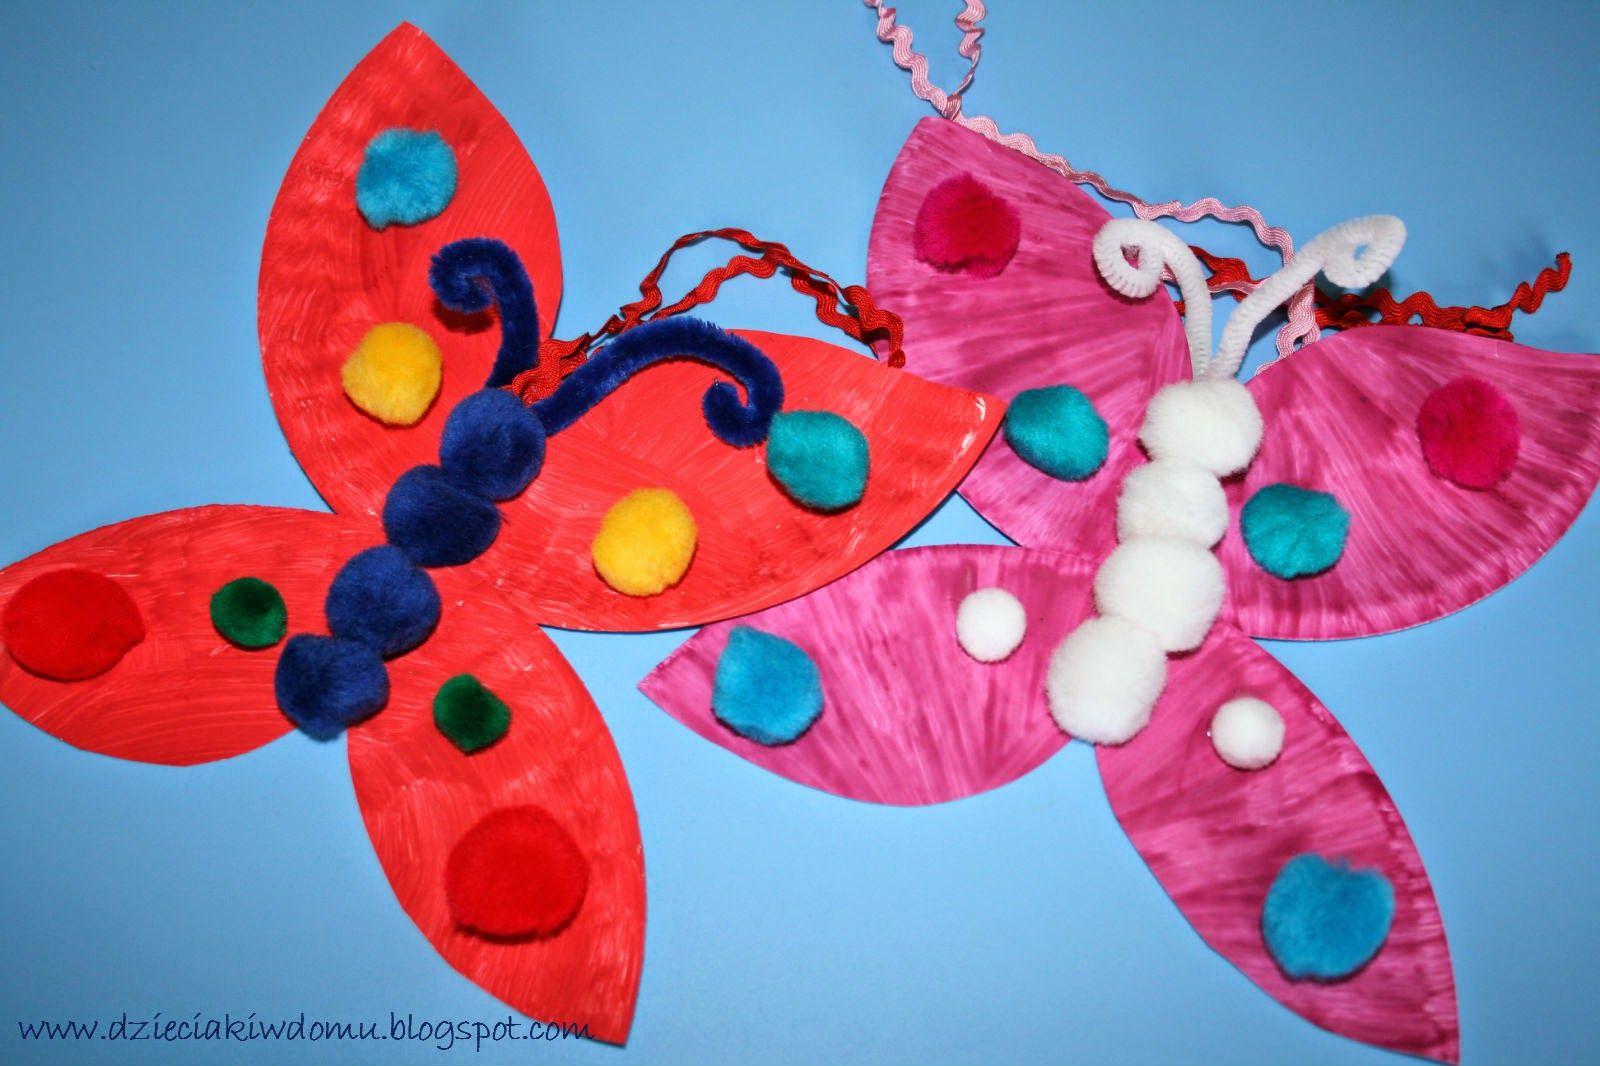 Kolorowe Motyle Dzieciaki W Domu Butterfly Crafts Paper Plate Crafts Plate Crafts